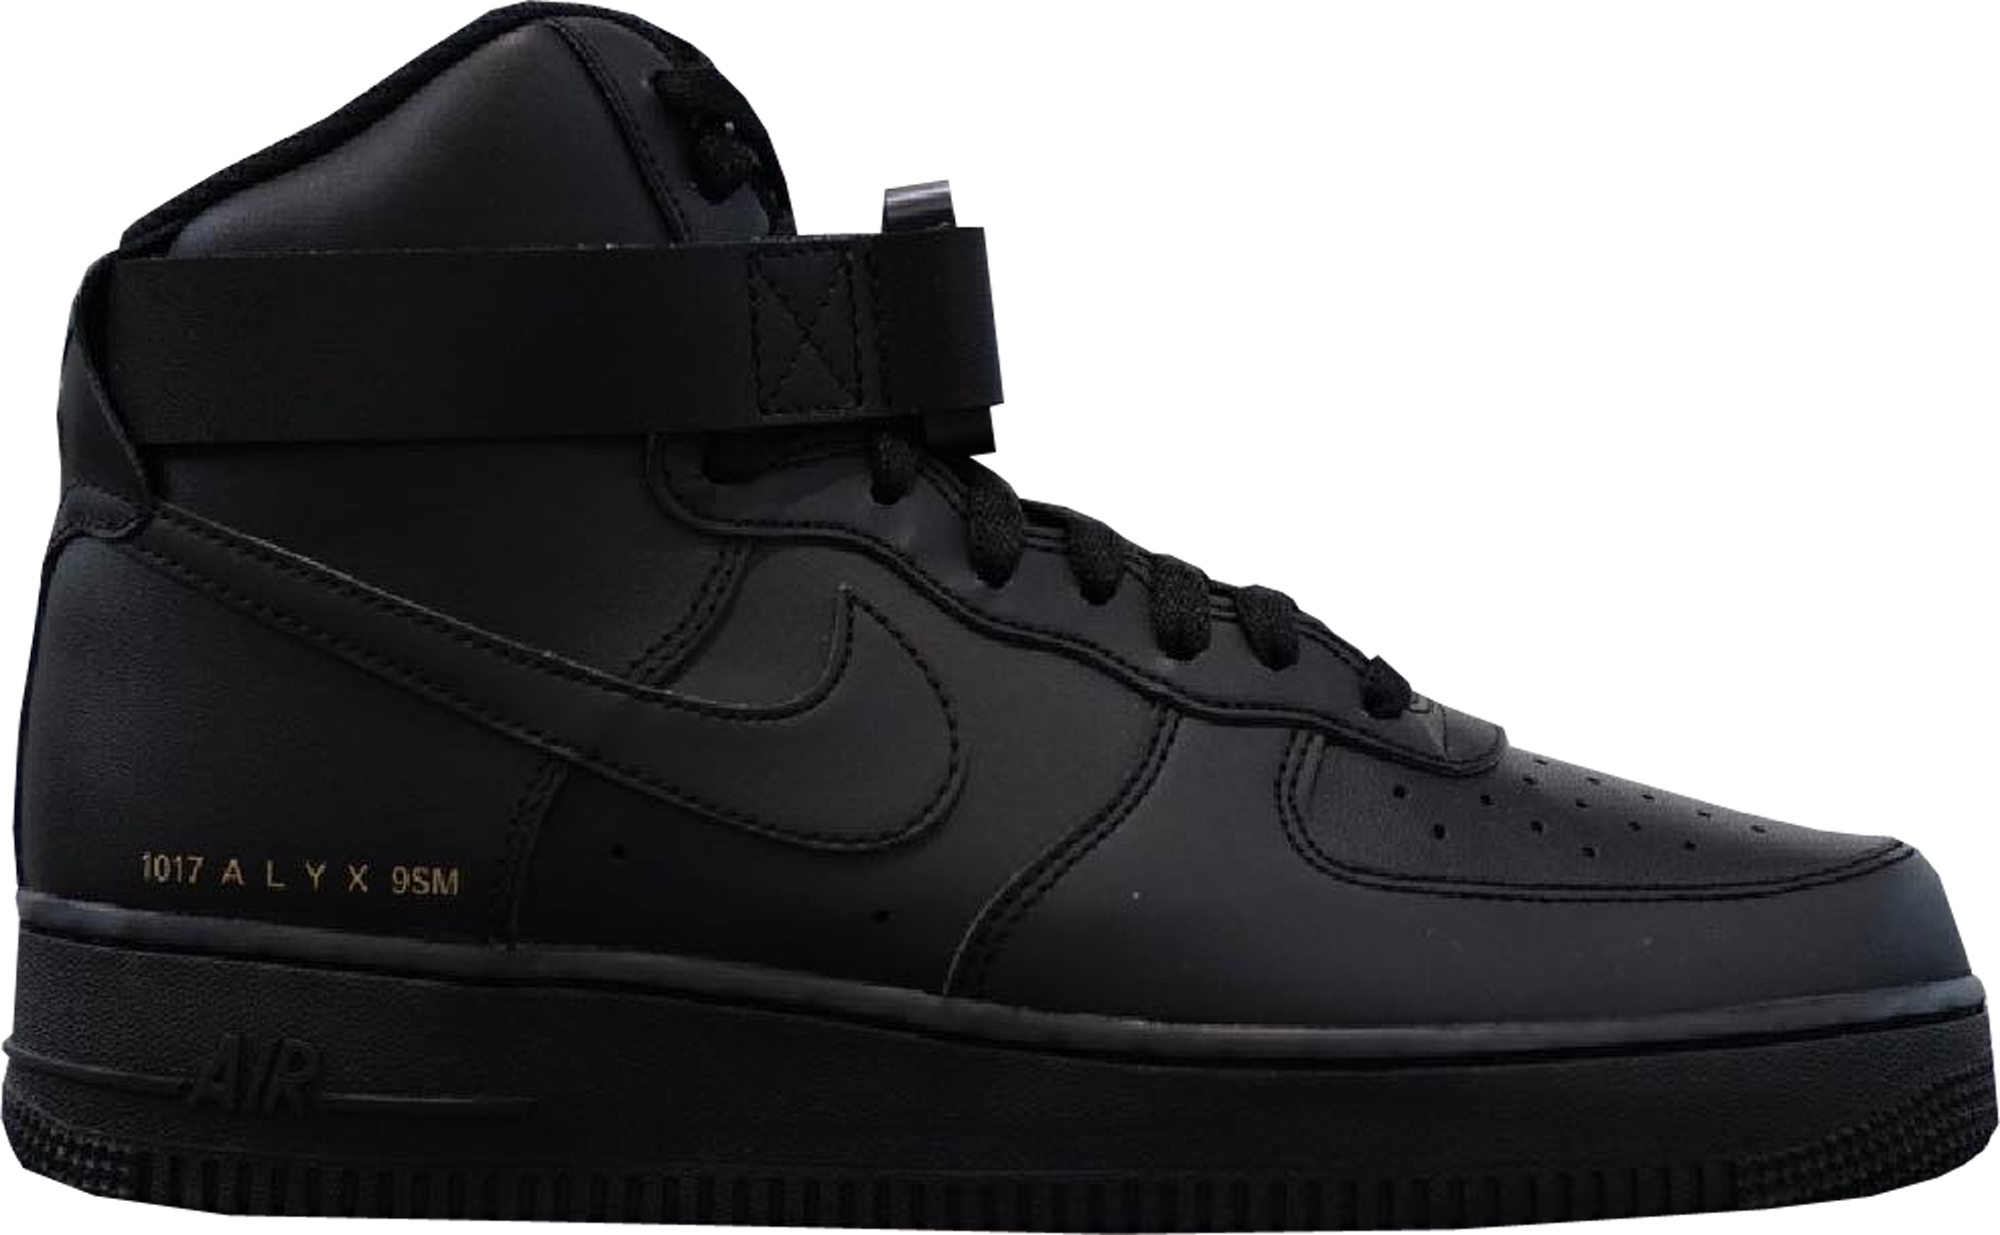 Nike Air Force 1 High ALYX Black - Sneakers